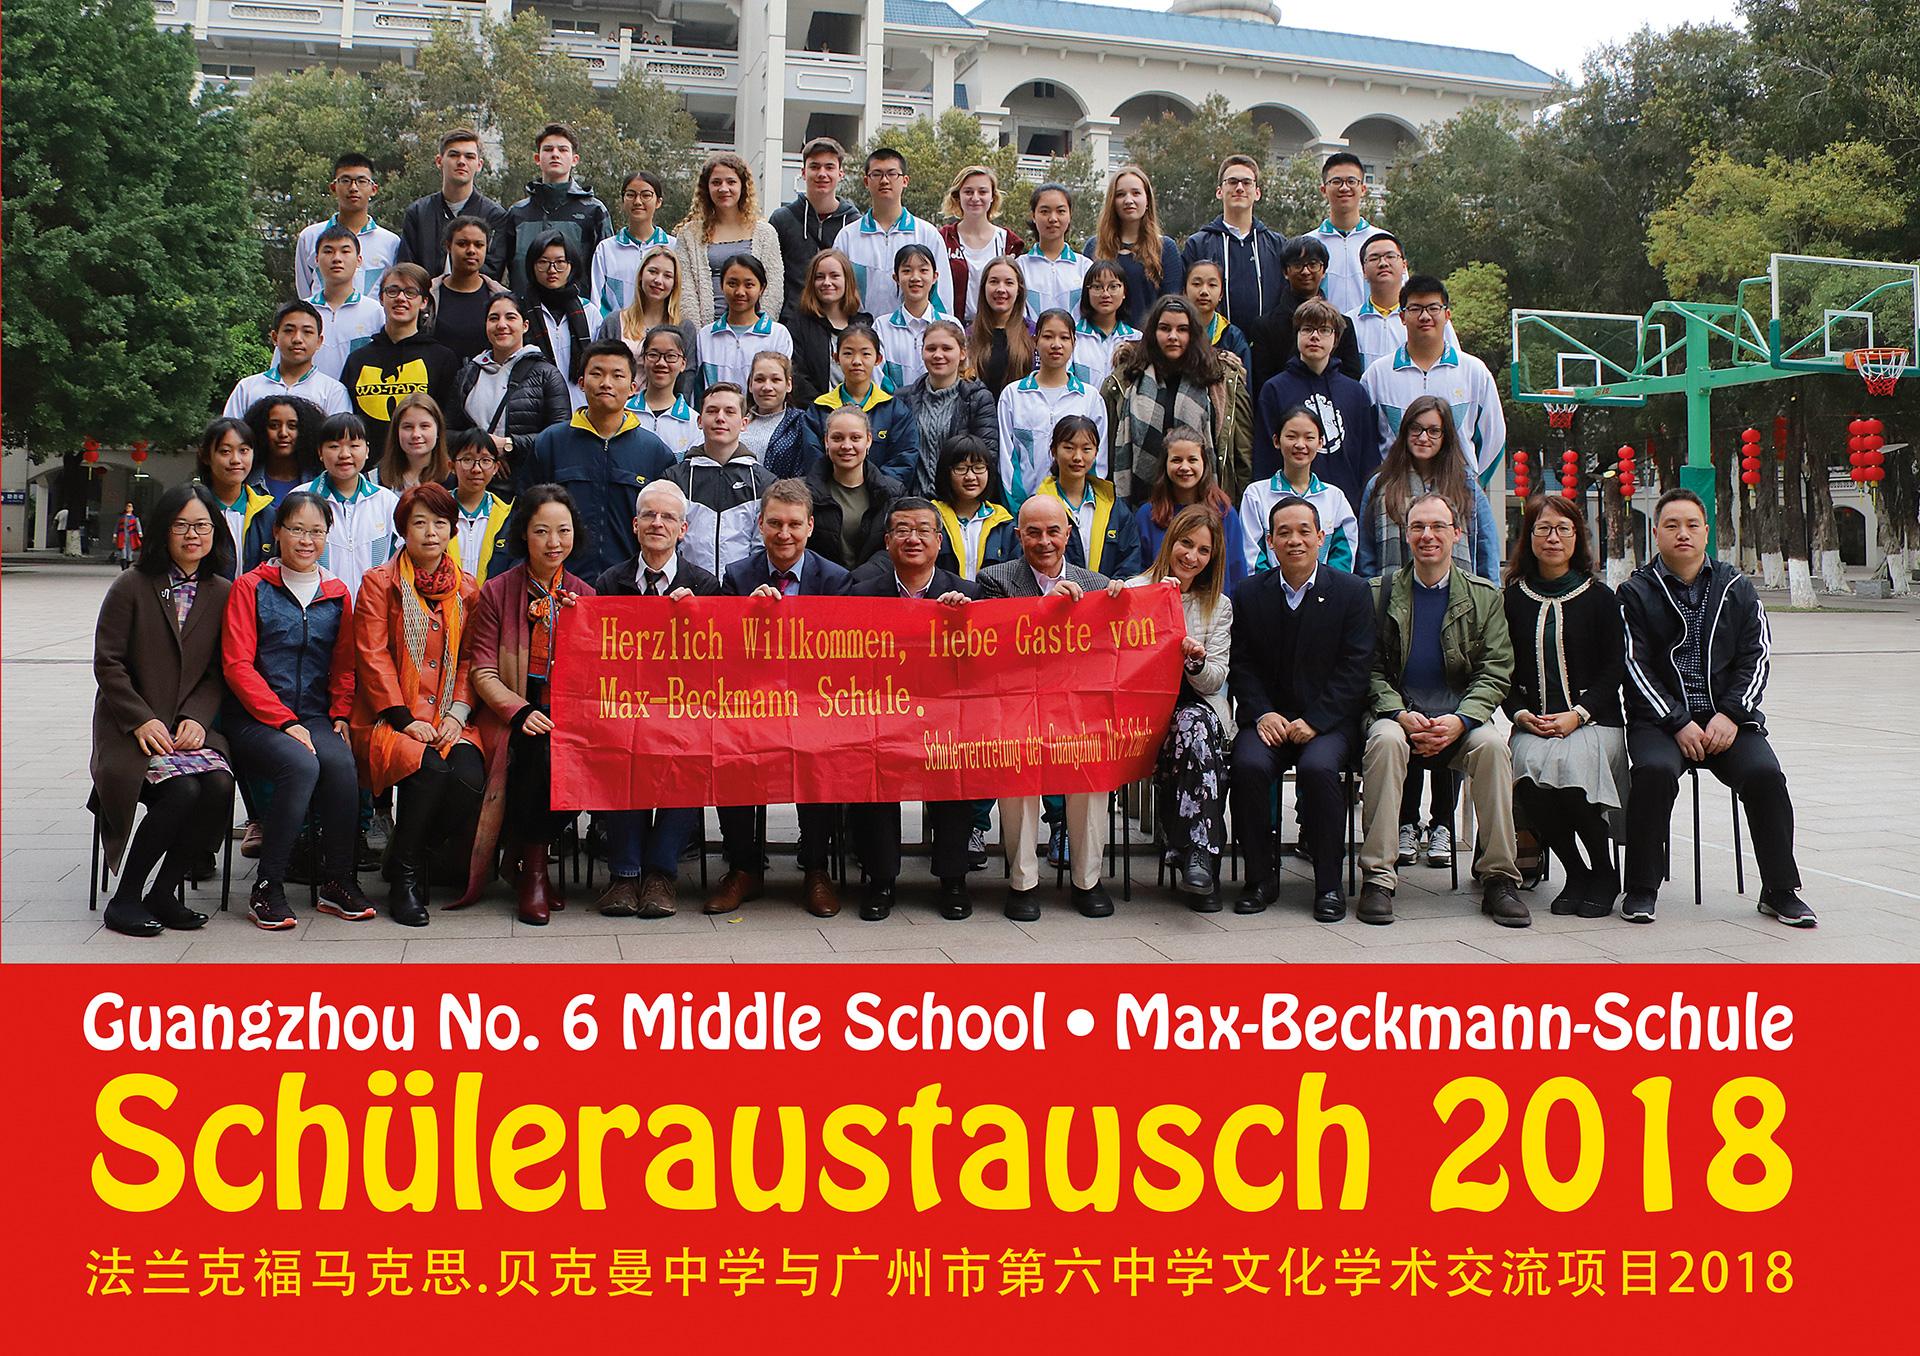 Max beckmann schule frankfurt